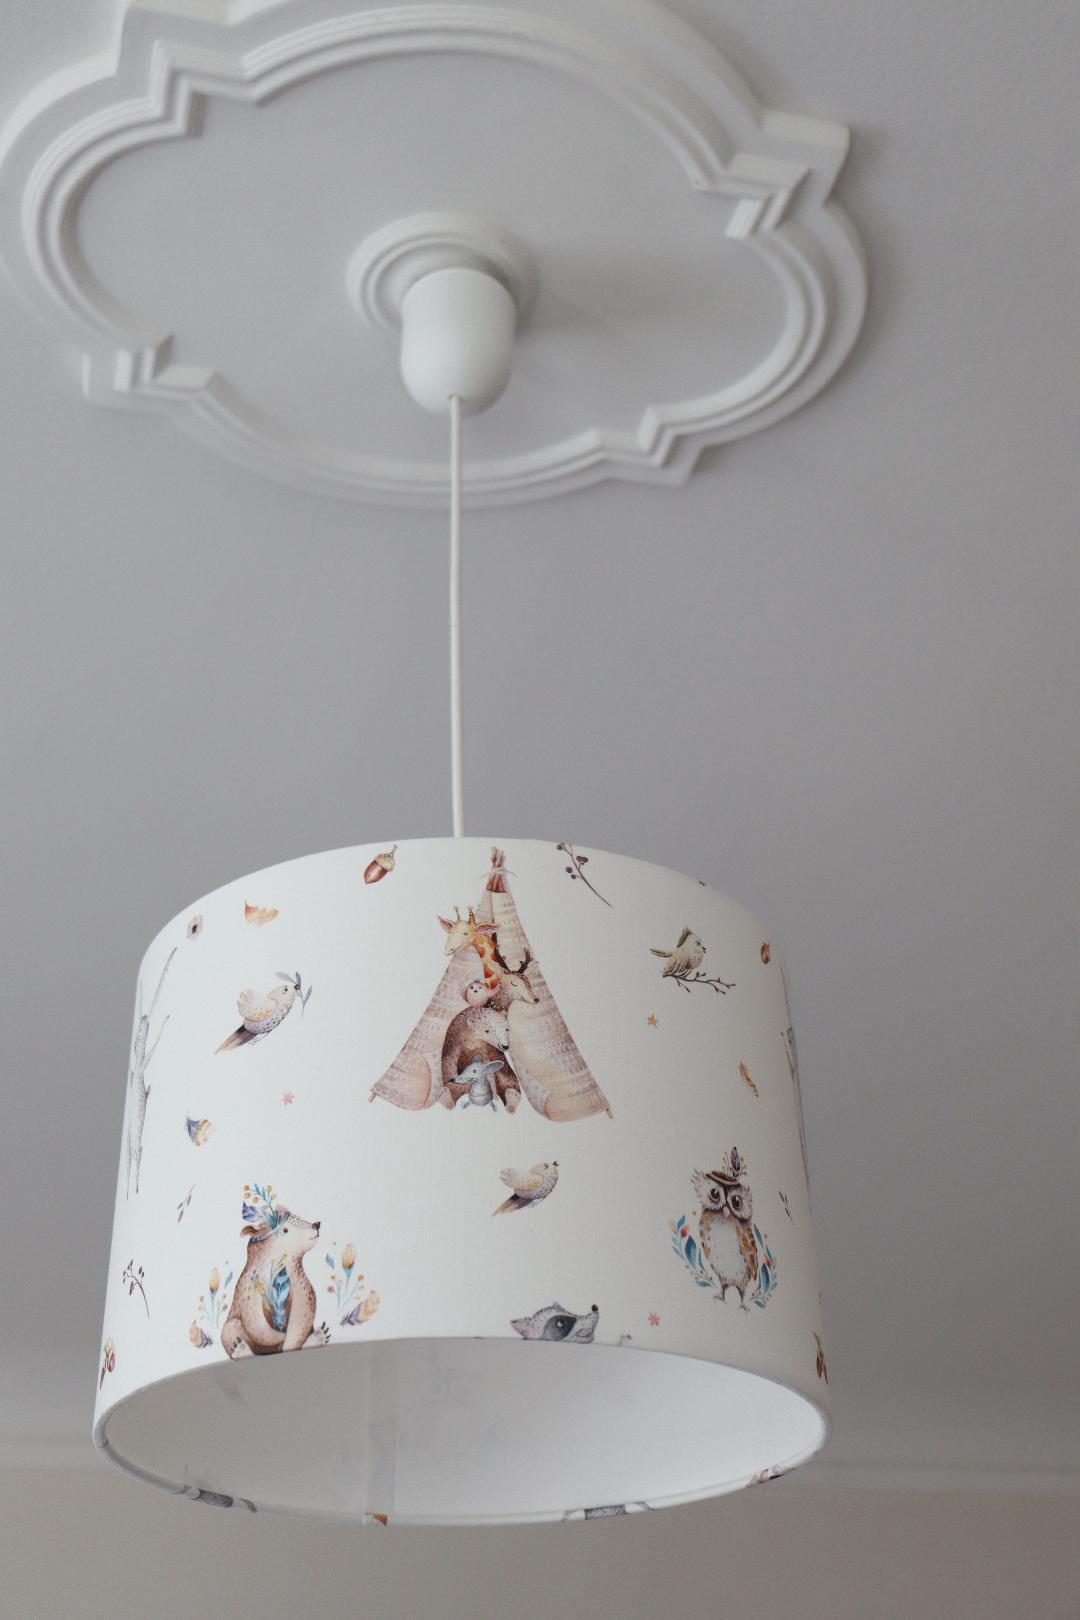 Lampe Kinderzimmer Lampenschirm Mädchen Kinderlampe Waldtiere Boho Kinderzimmerlampe Tiere Vögel Tipi Boho Lampe Boho Deko